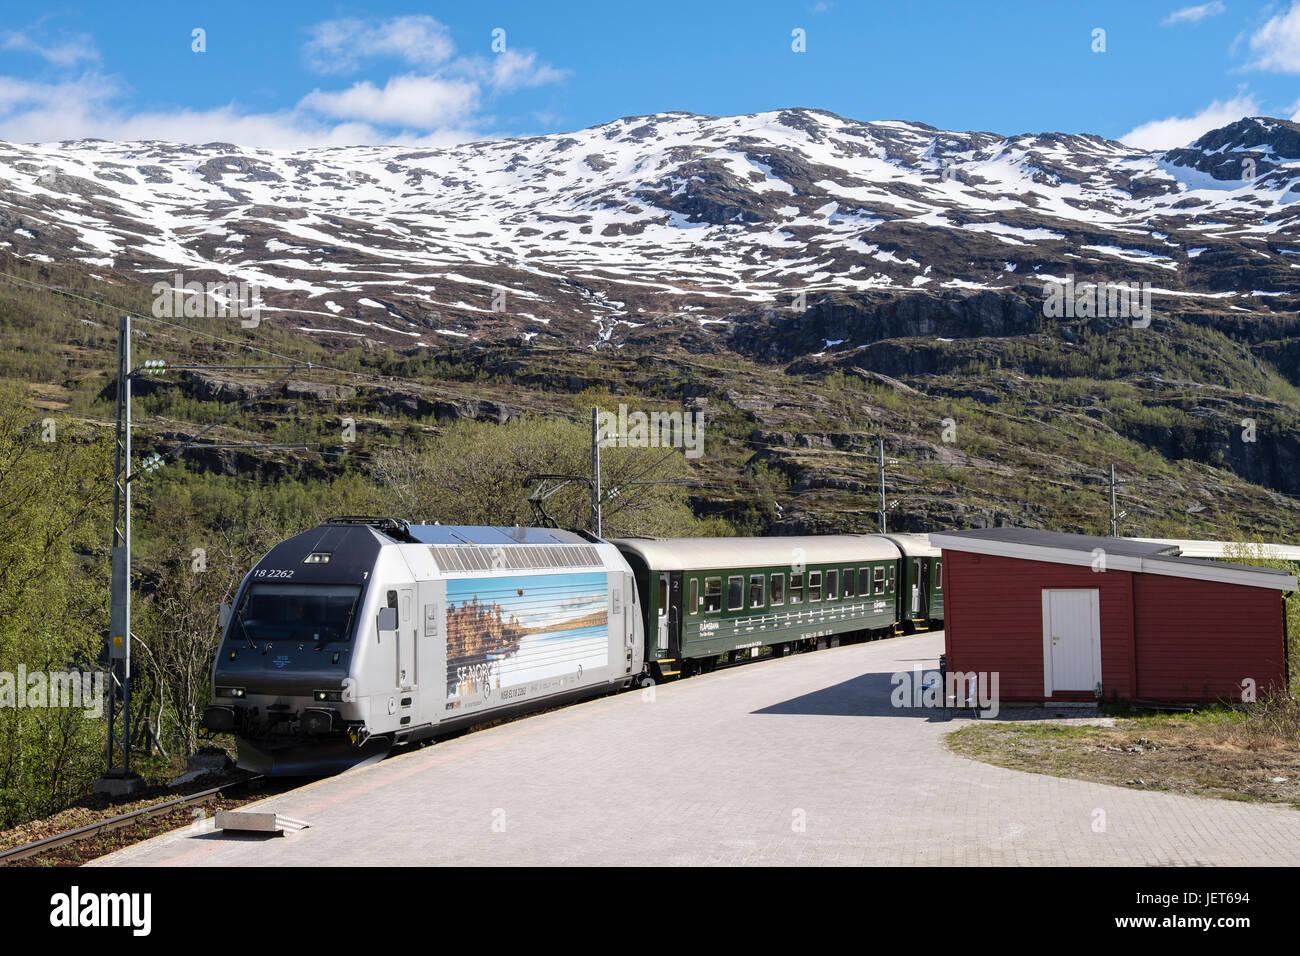 Flamsbana or Flam Railway train by the station platform. Vatnahelsen, Aurland, Norway, Scandinavia - Stock Image